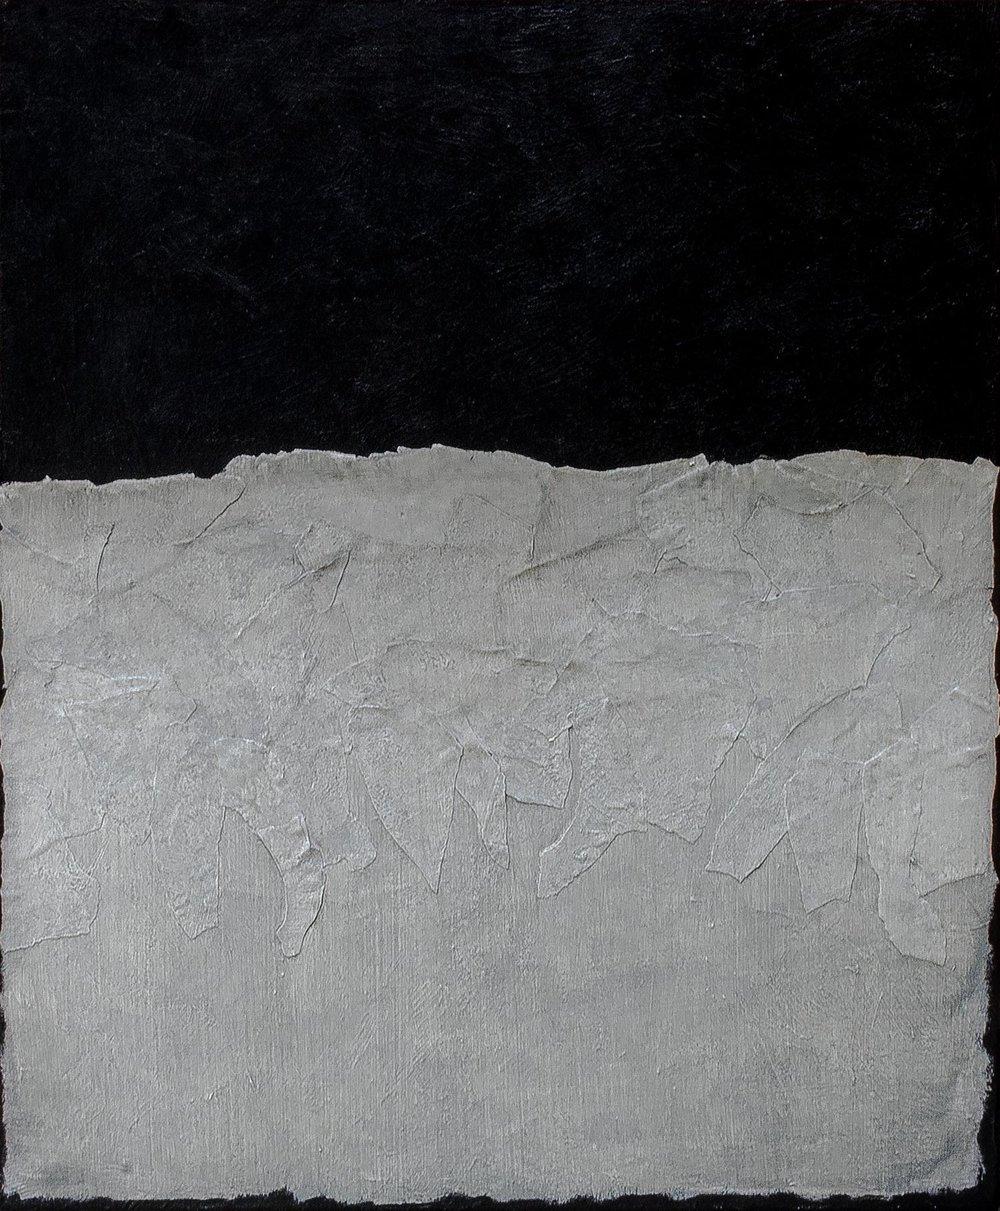 """Paisaje helado / Iced landscape"""